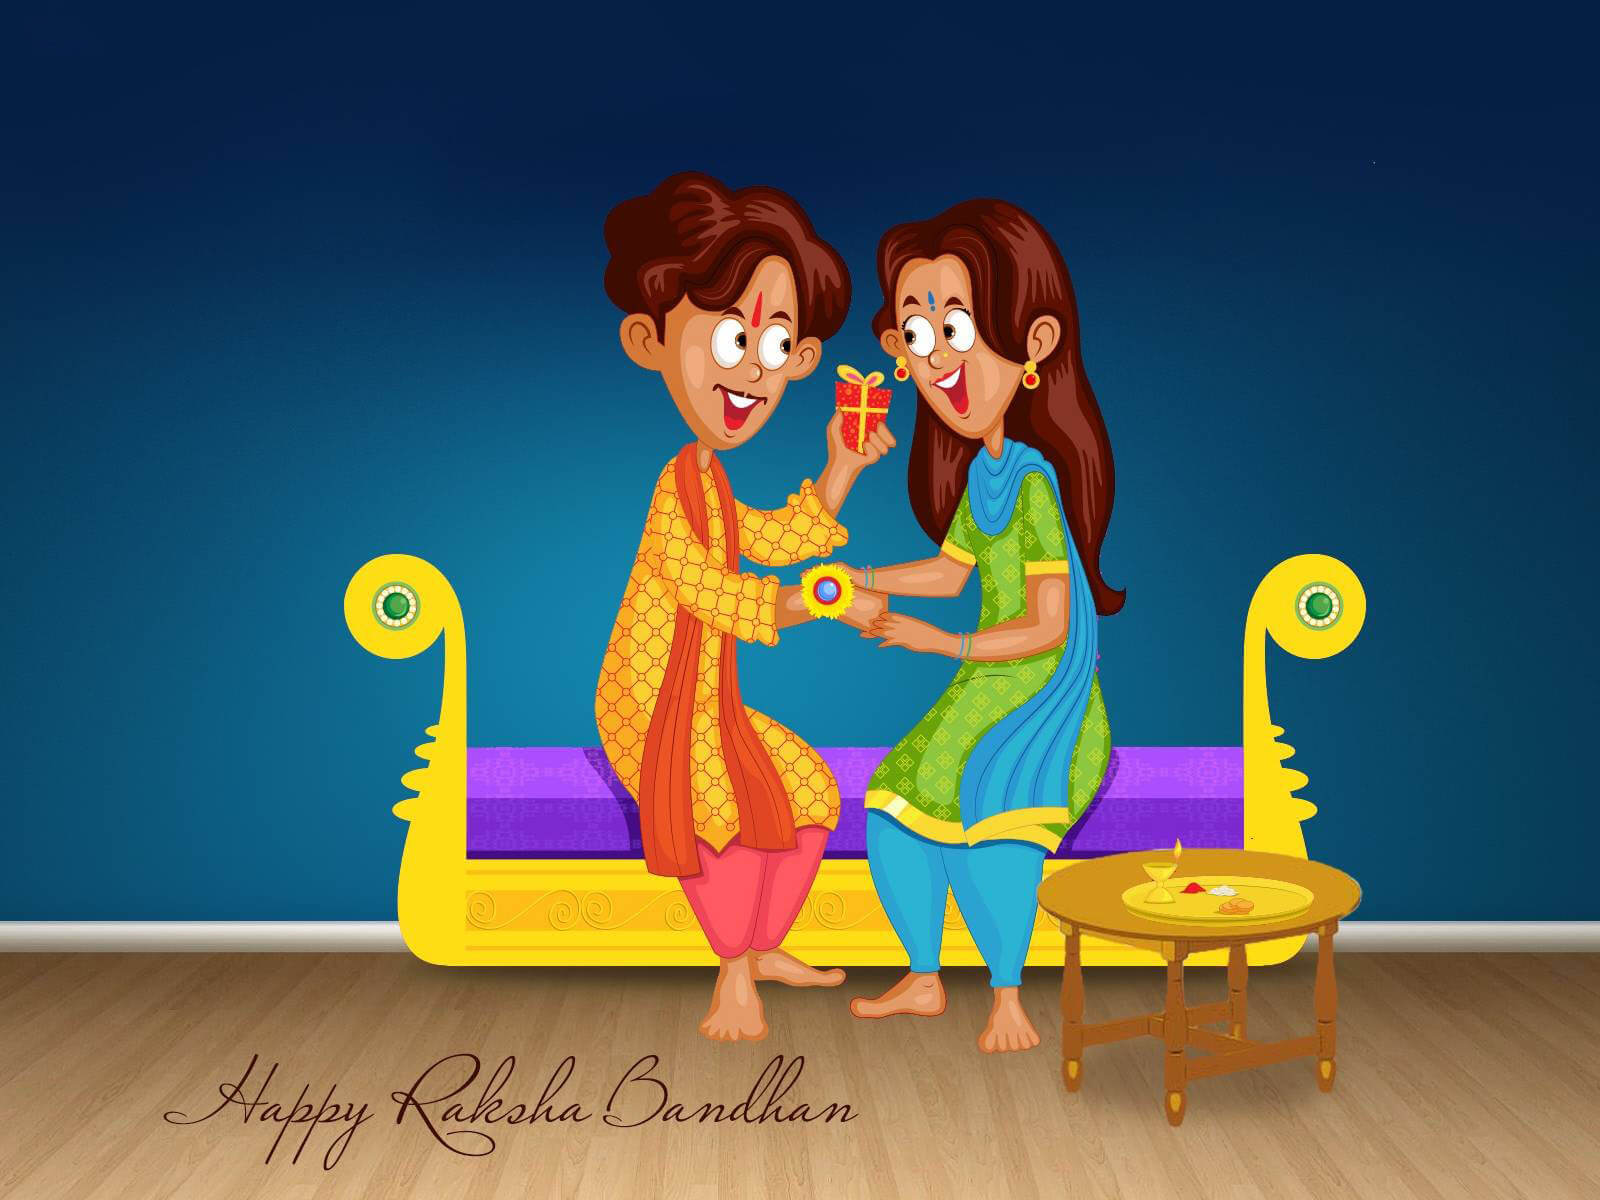 happy raksha bandhan hd cartoon wallpaper